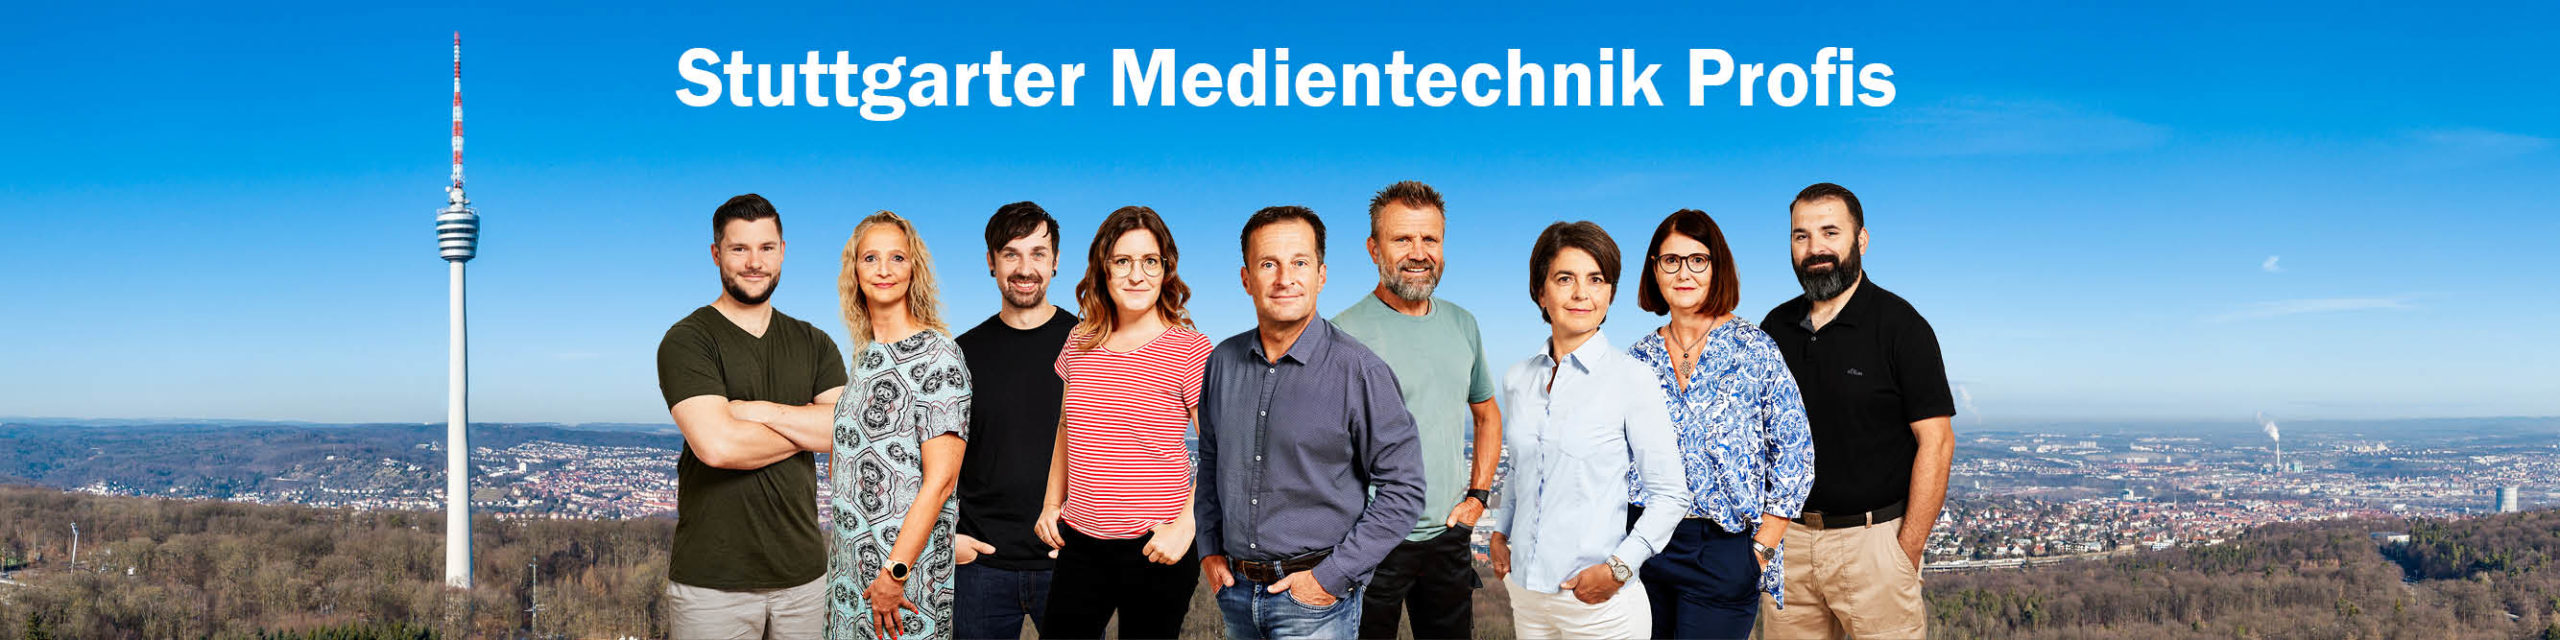 Stuttgarter Medientechnik Profis: beamer & more Mitarbeiter(-innen)